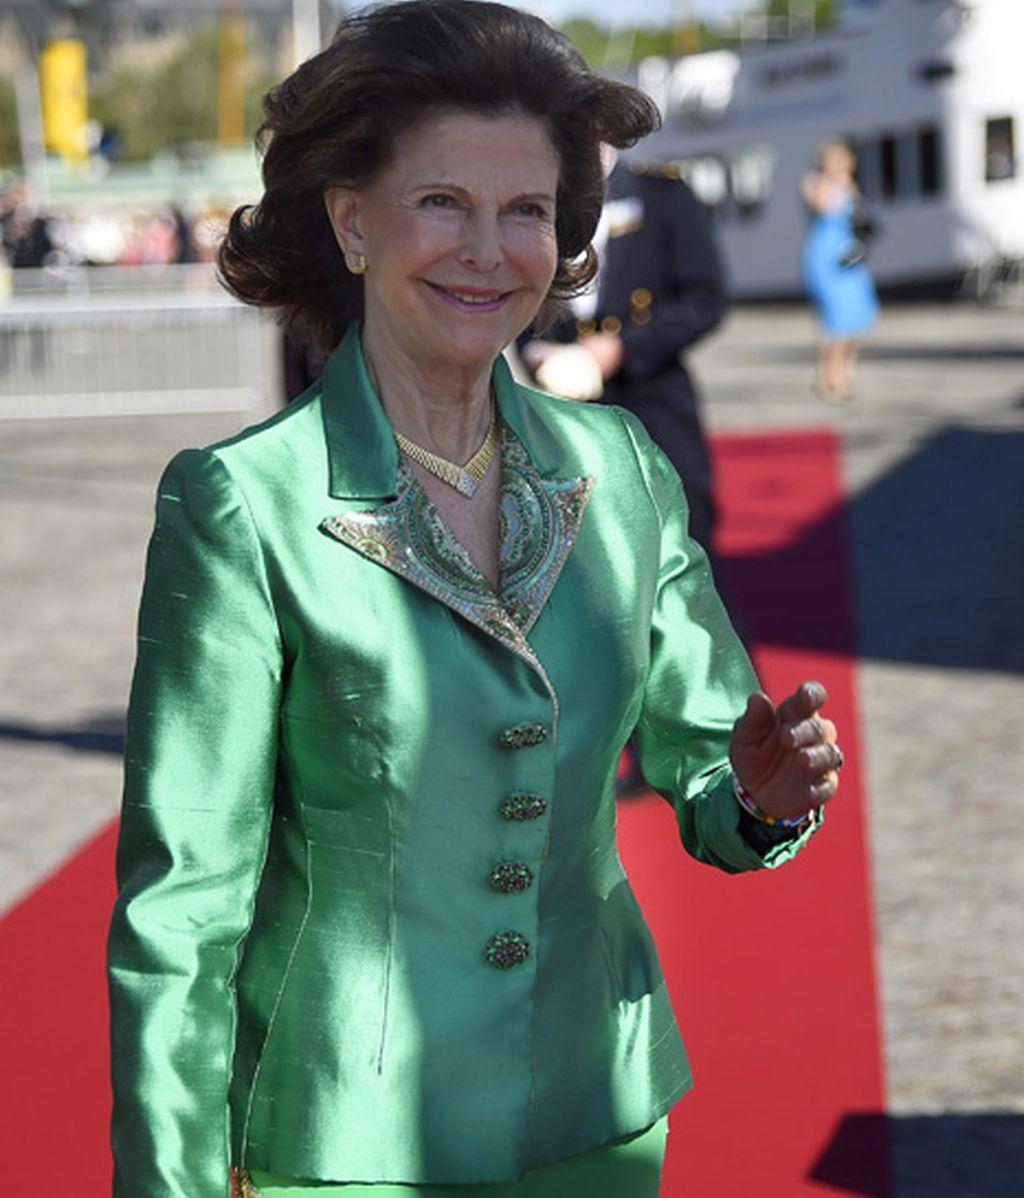 La reina Silvia se atrevió con este vestido verde